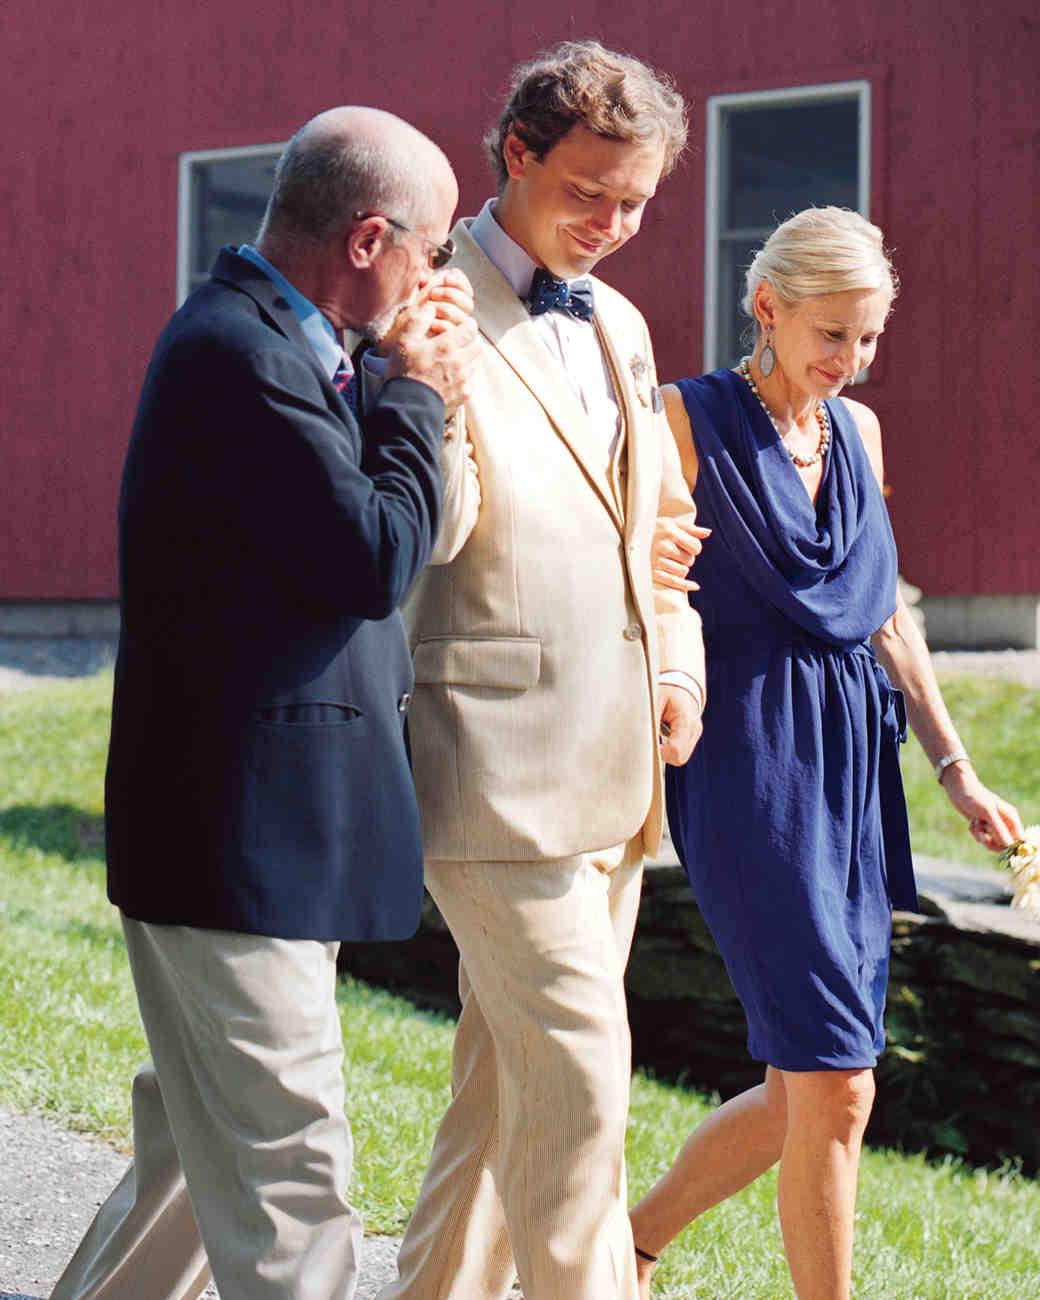 groom-family-mwd107926.jpg